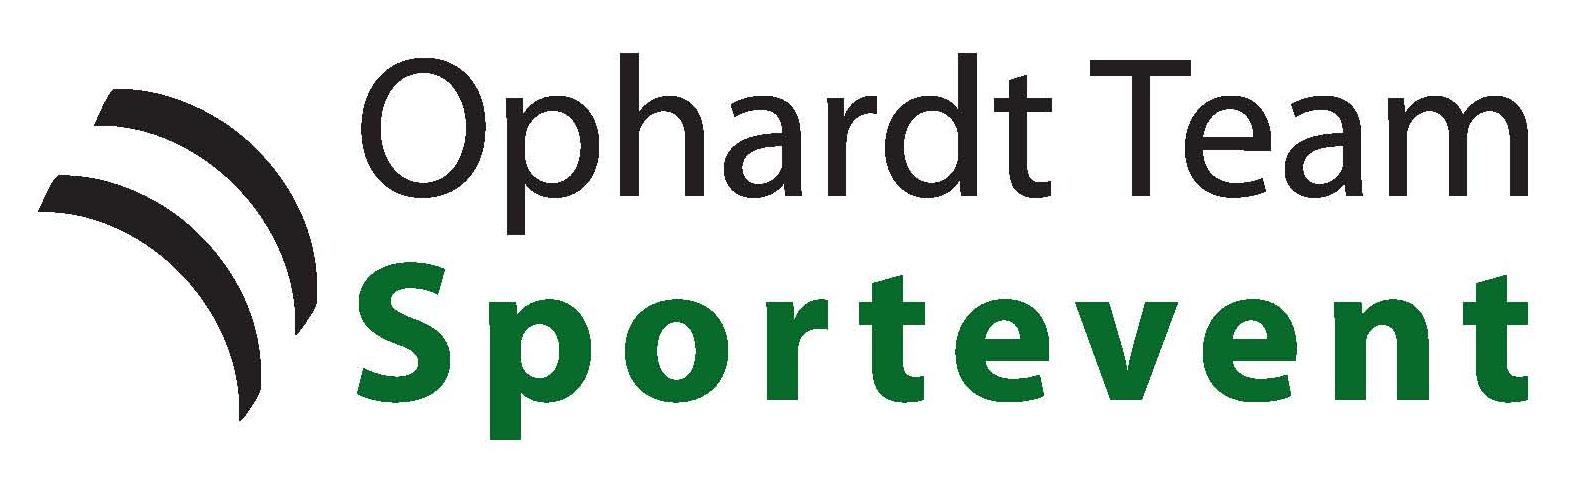 Ophardt